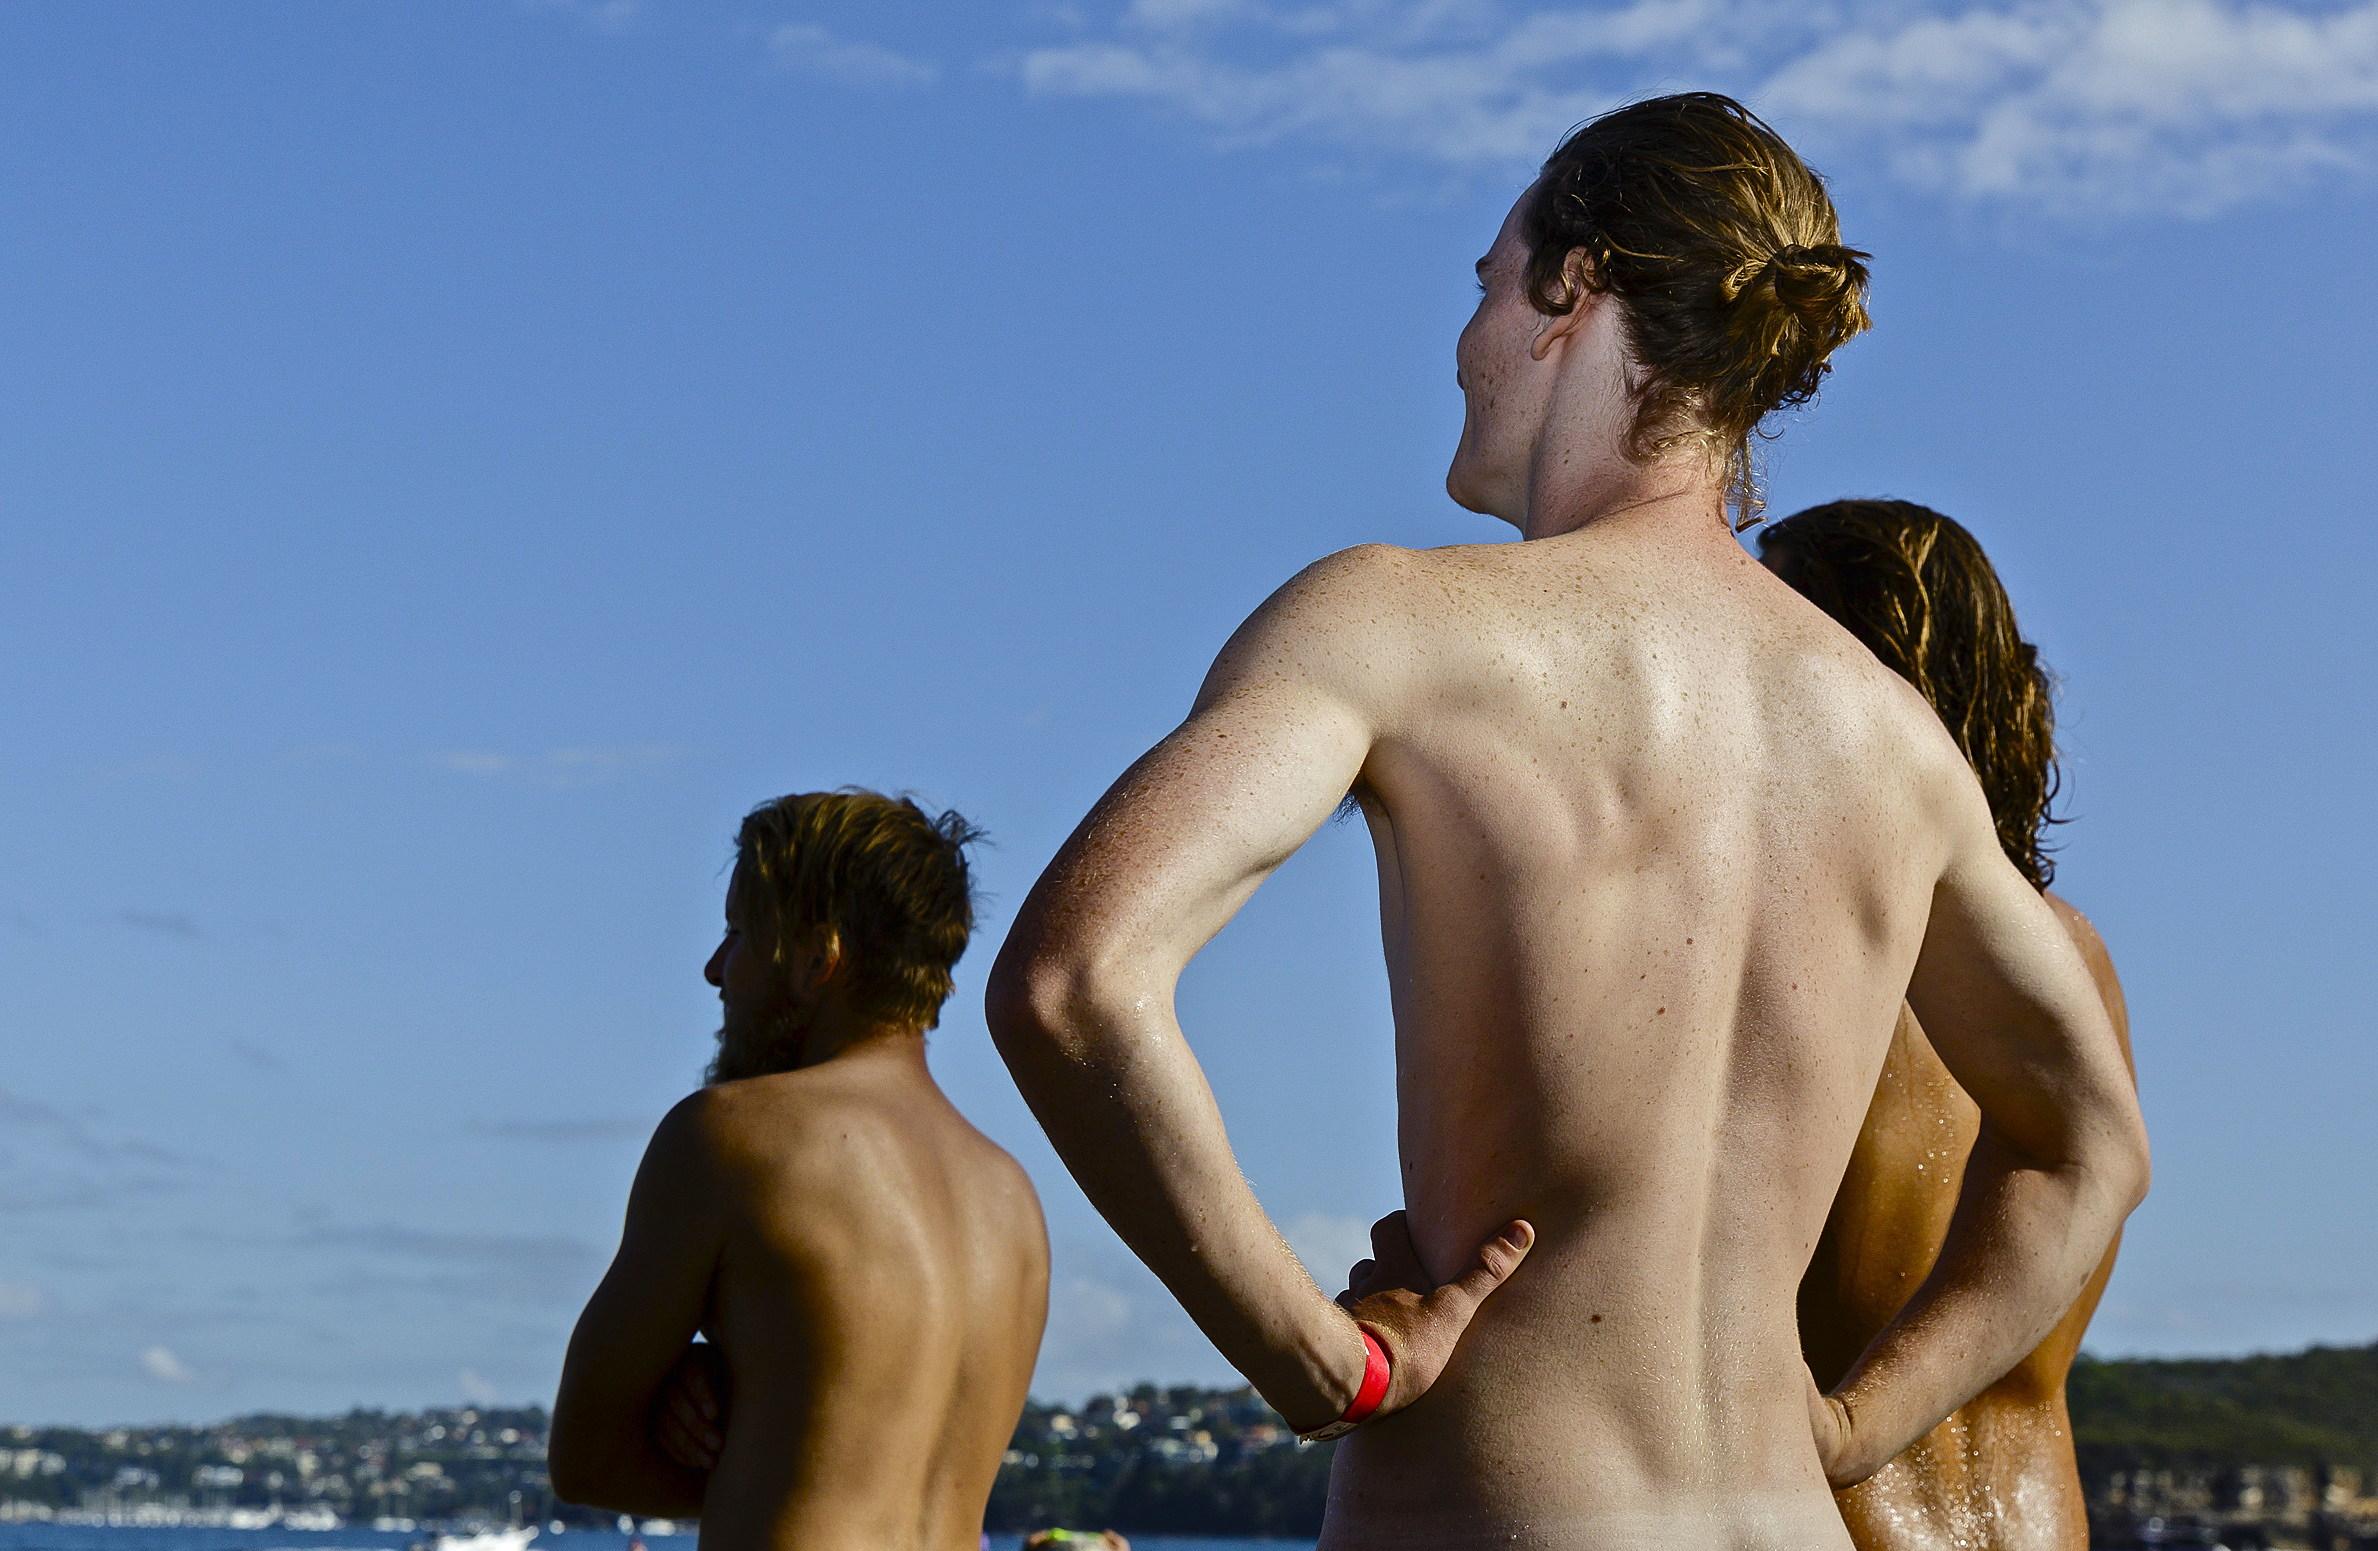 Massachusetts nudist camps